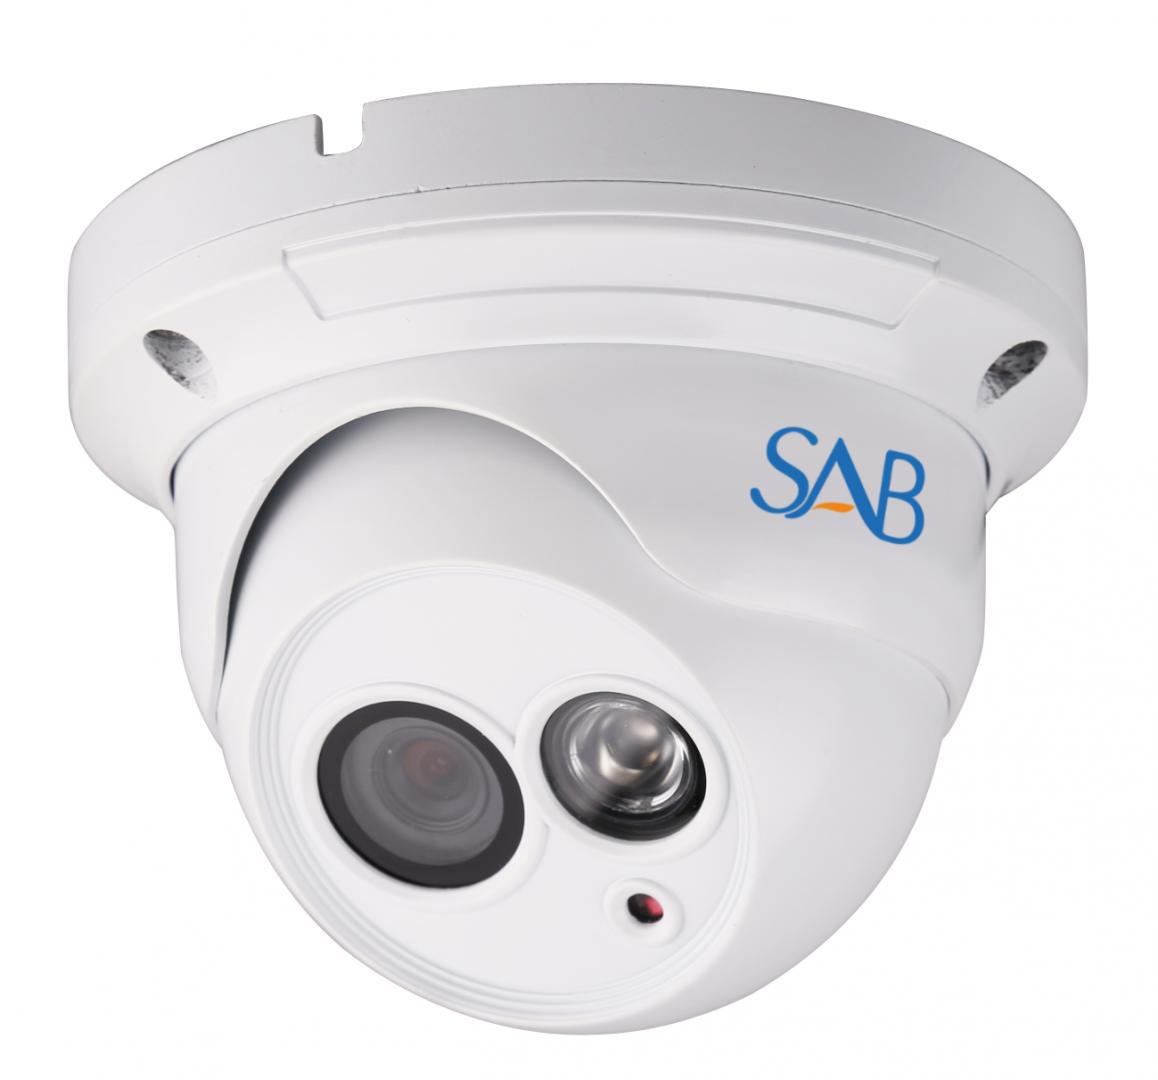 SAB IP1100 Camera Outdoor HD PoE Dome 720p IP Netzwerk Videoüberwachung Kamera